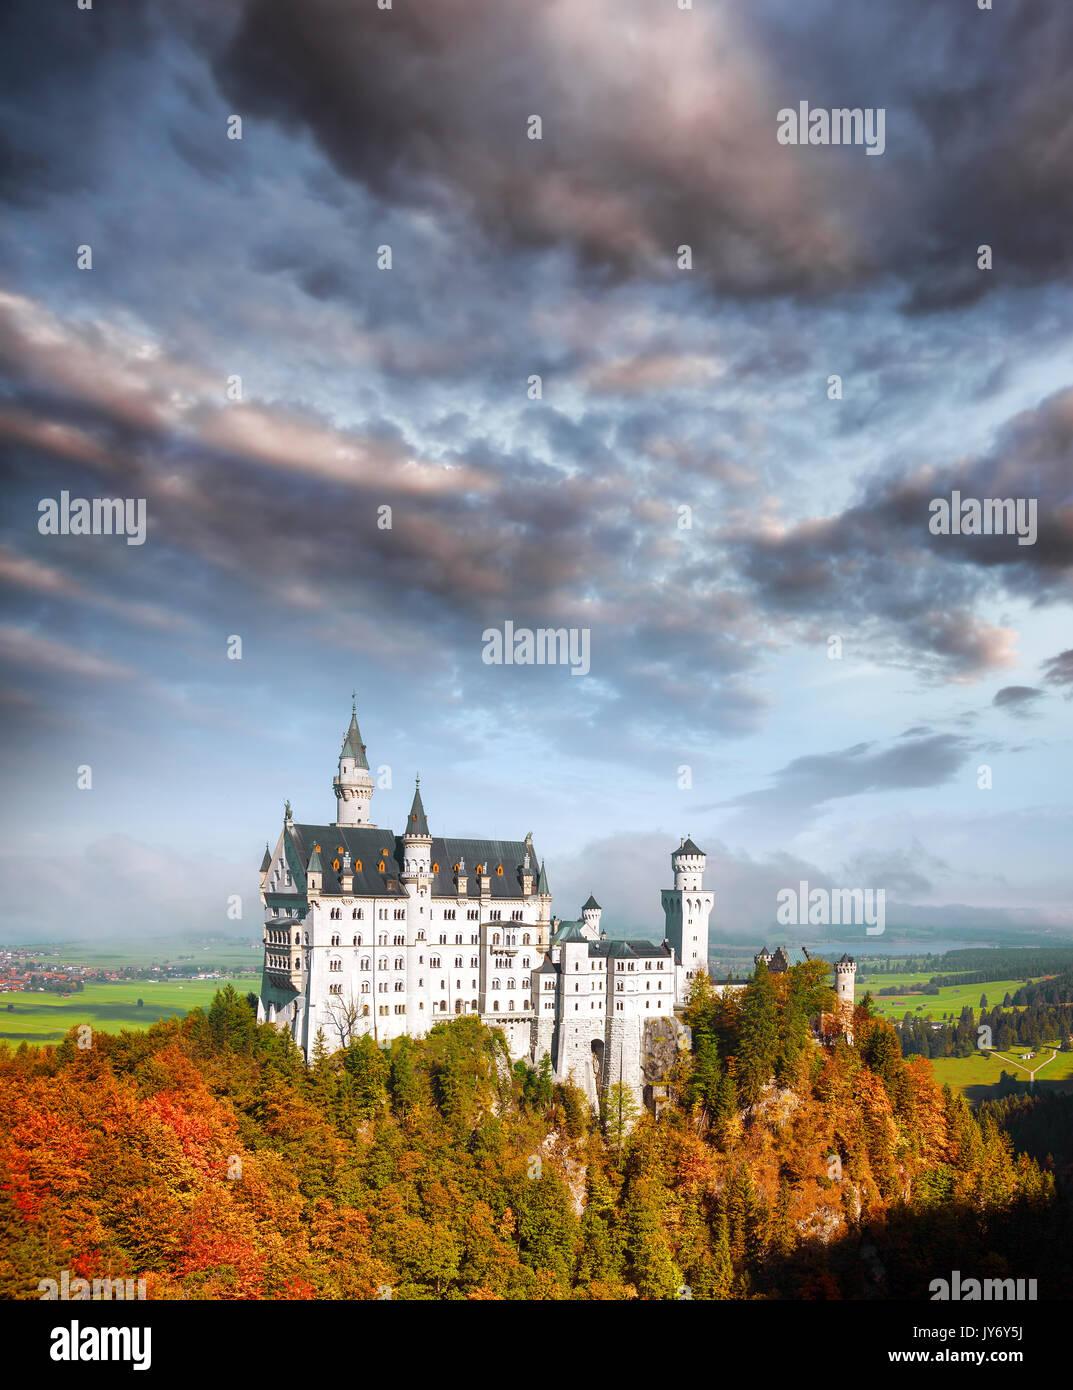 Famous Neuschwanstein castle in Bavaria, Germany - Stock Image